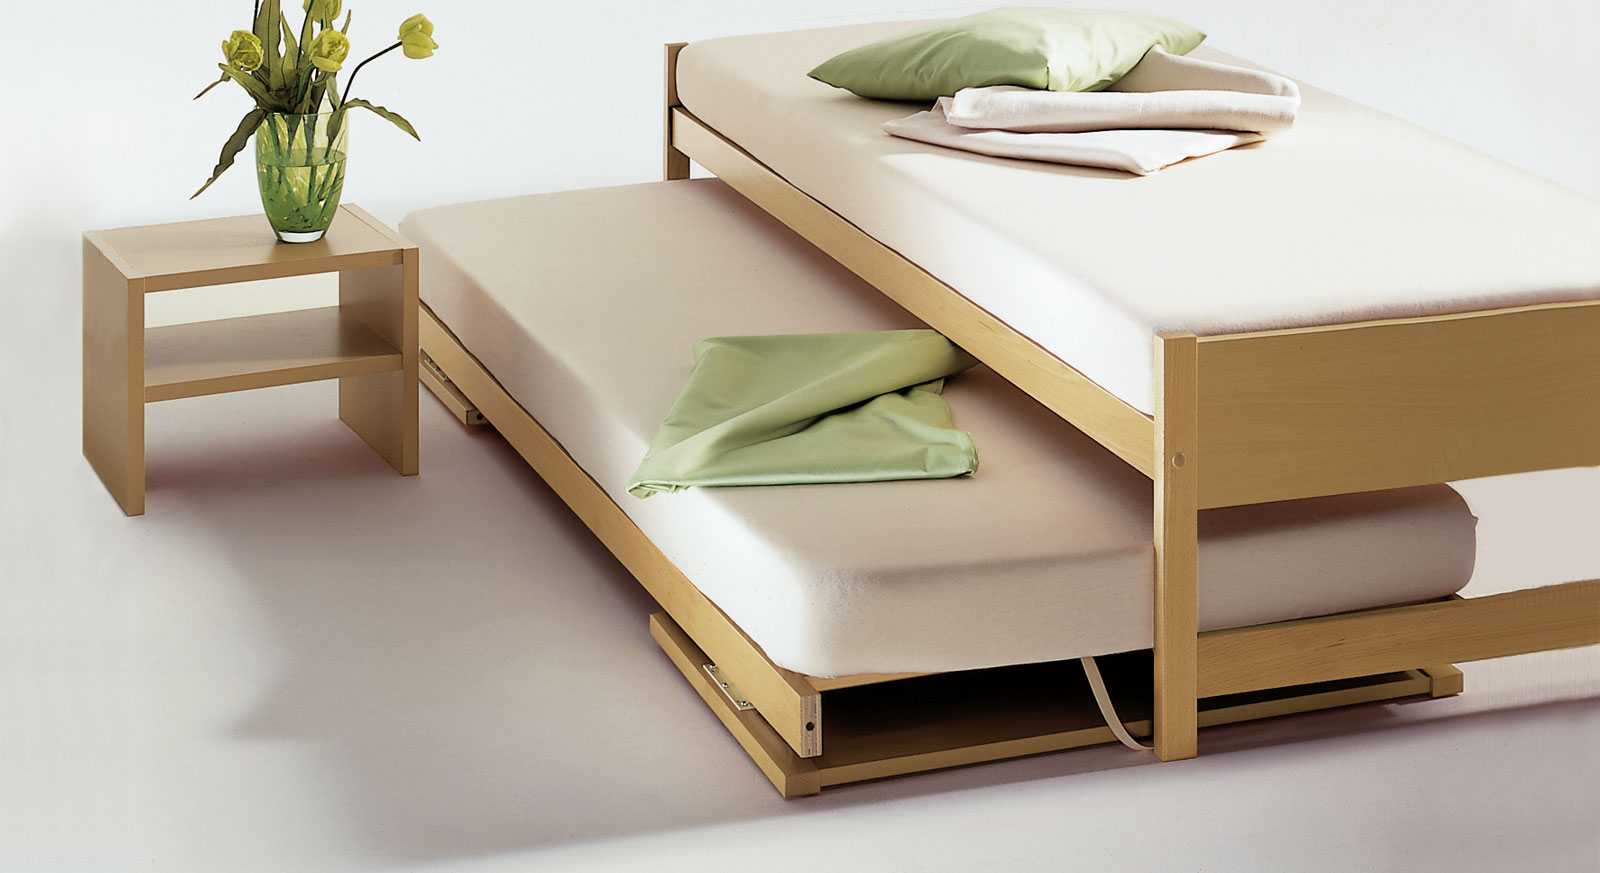 Full Size of Bett Ausziehbar Gleiche Ebene Ikea Zwei Betten Gleicher Gre Unser Ausziehbett On Top Dusche Ebenerdig 140x200 120x200 Erhöhtes Wand Bette Badewanne Mit Wohnzimmer Bett Ausziehbar Gleiche Ebene